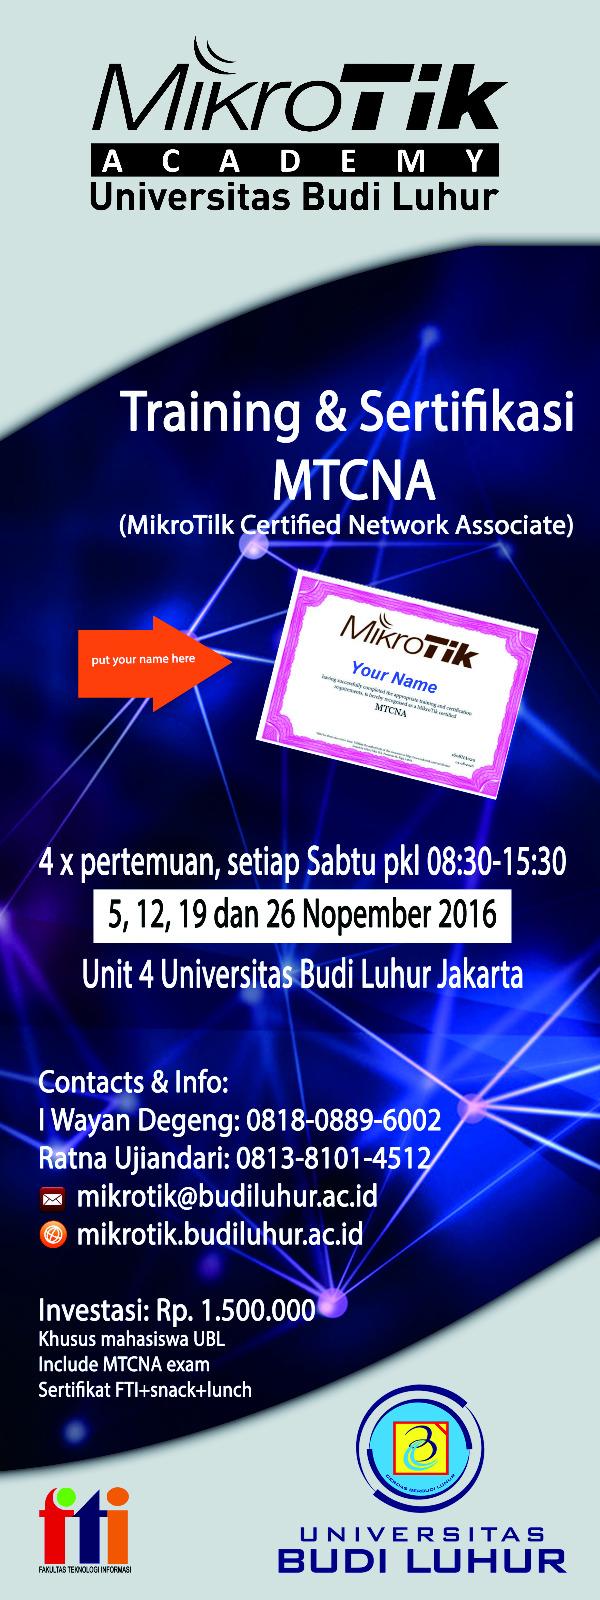 Training & Sertifikasi Mikrotik MTCNA